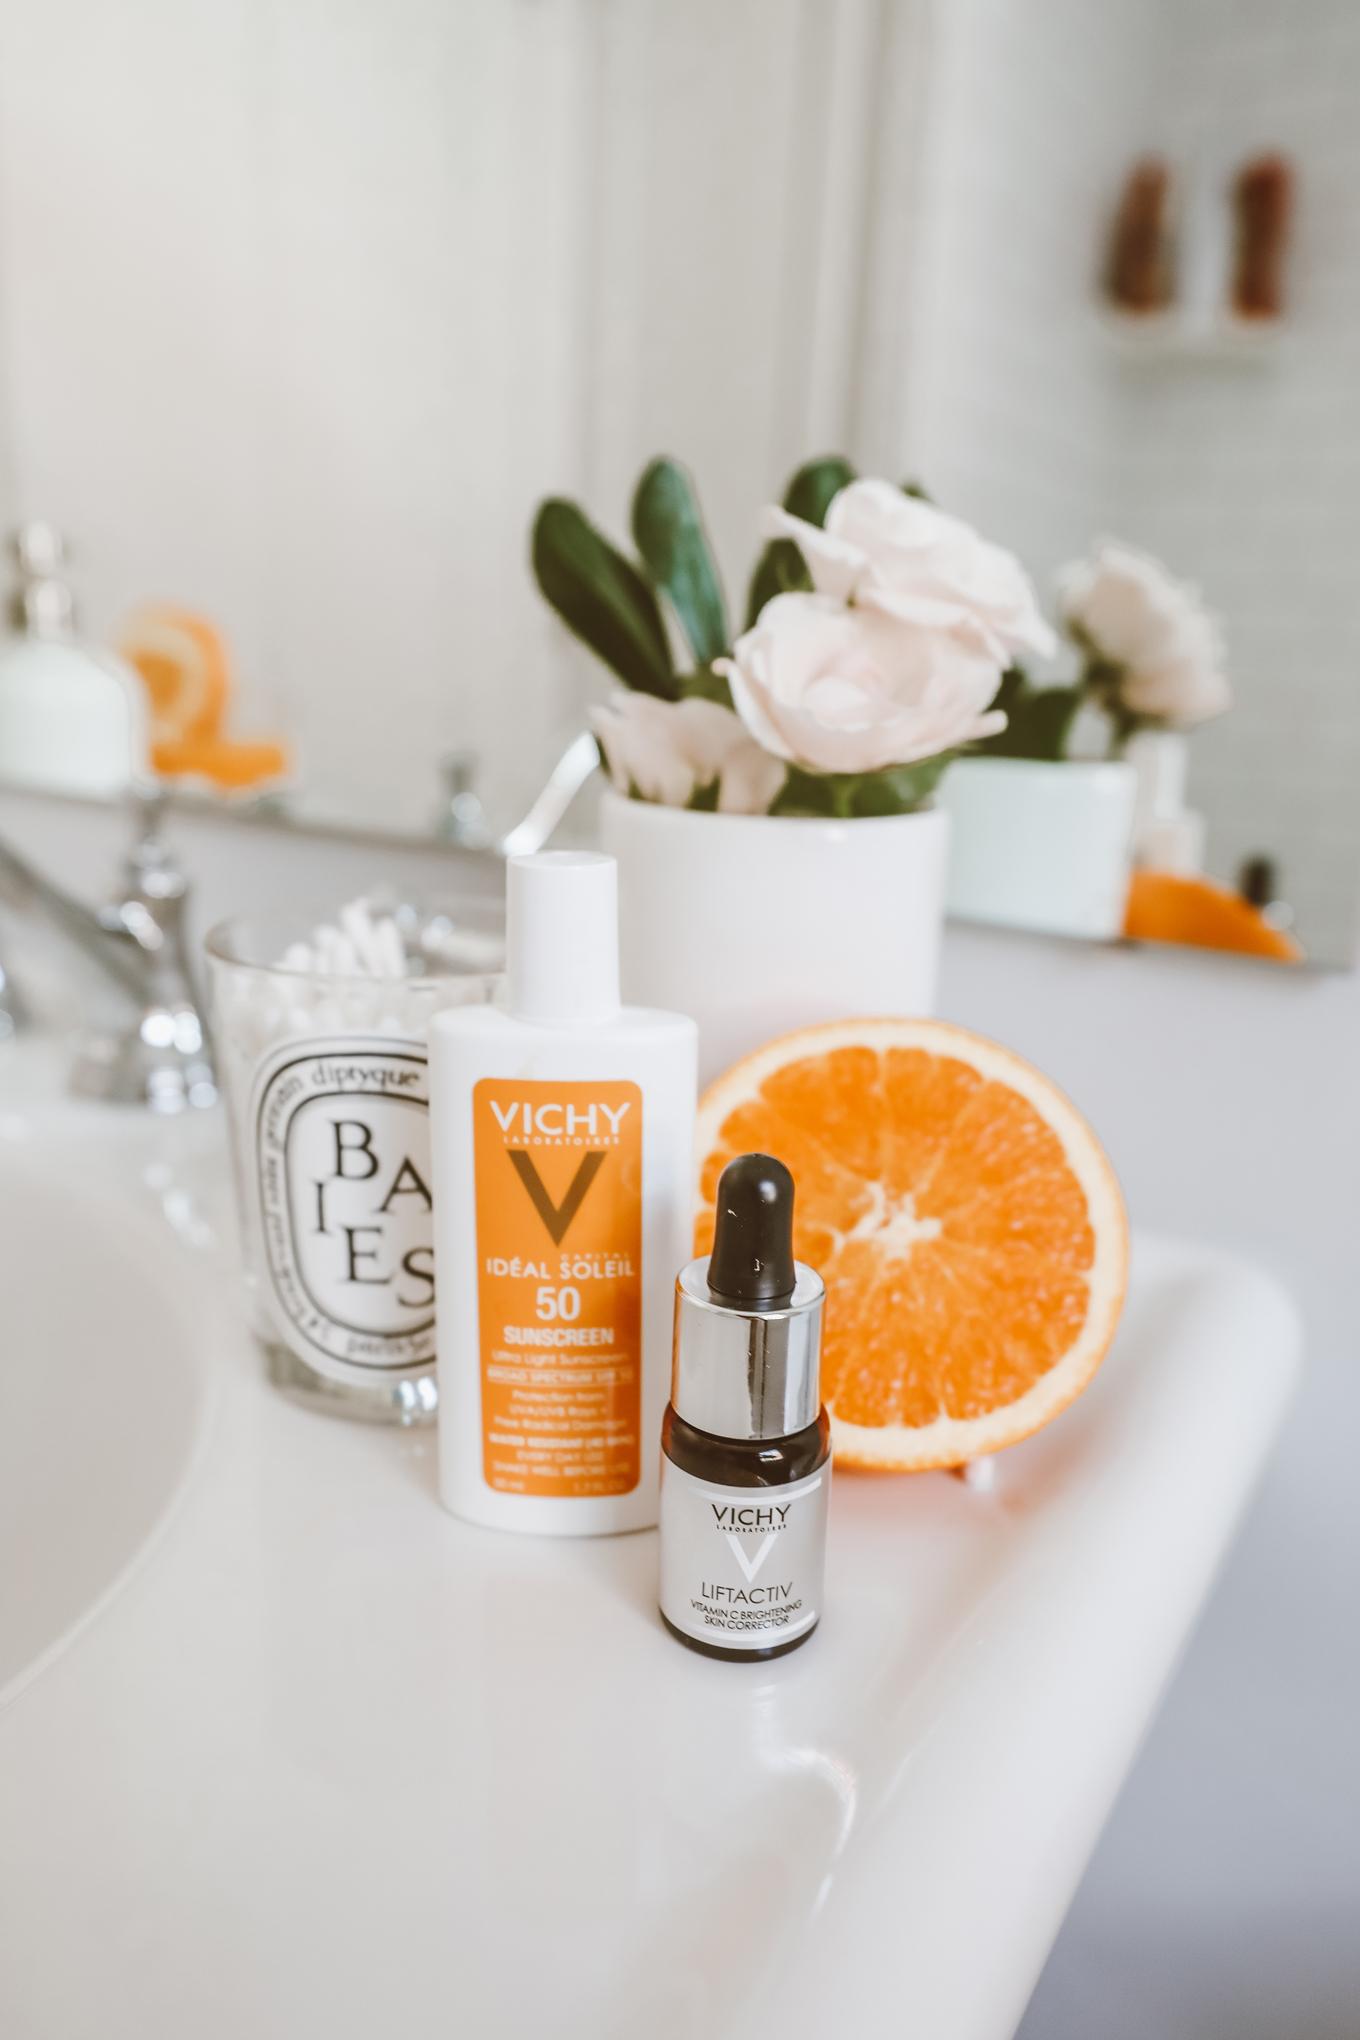 vichy vitamin c serum